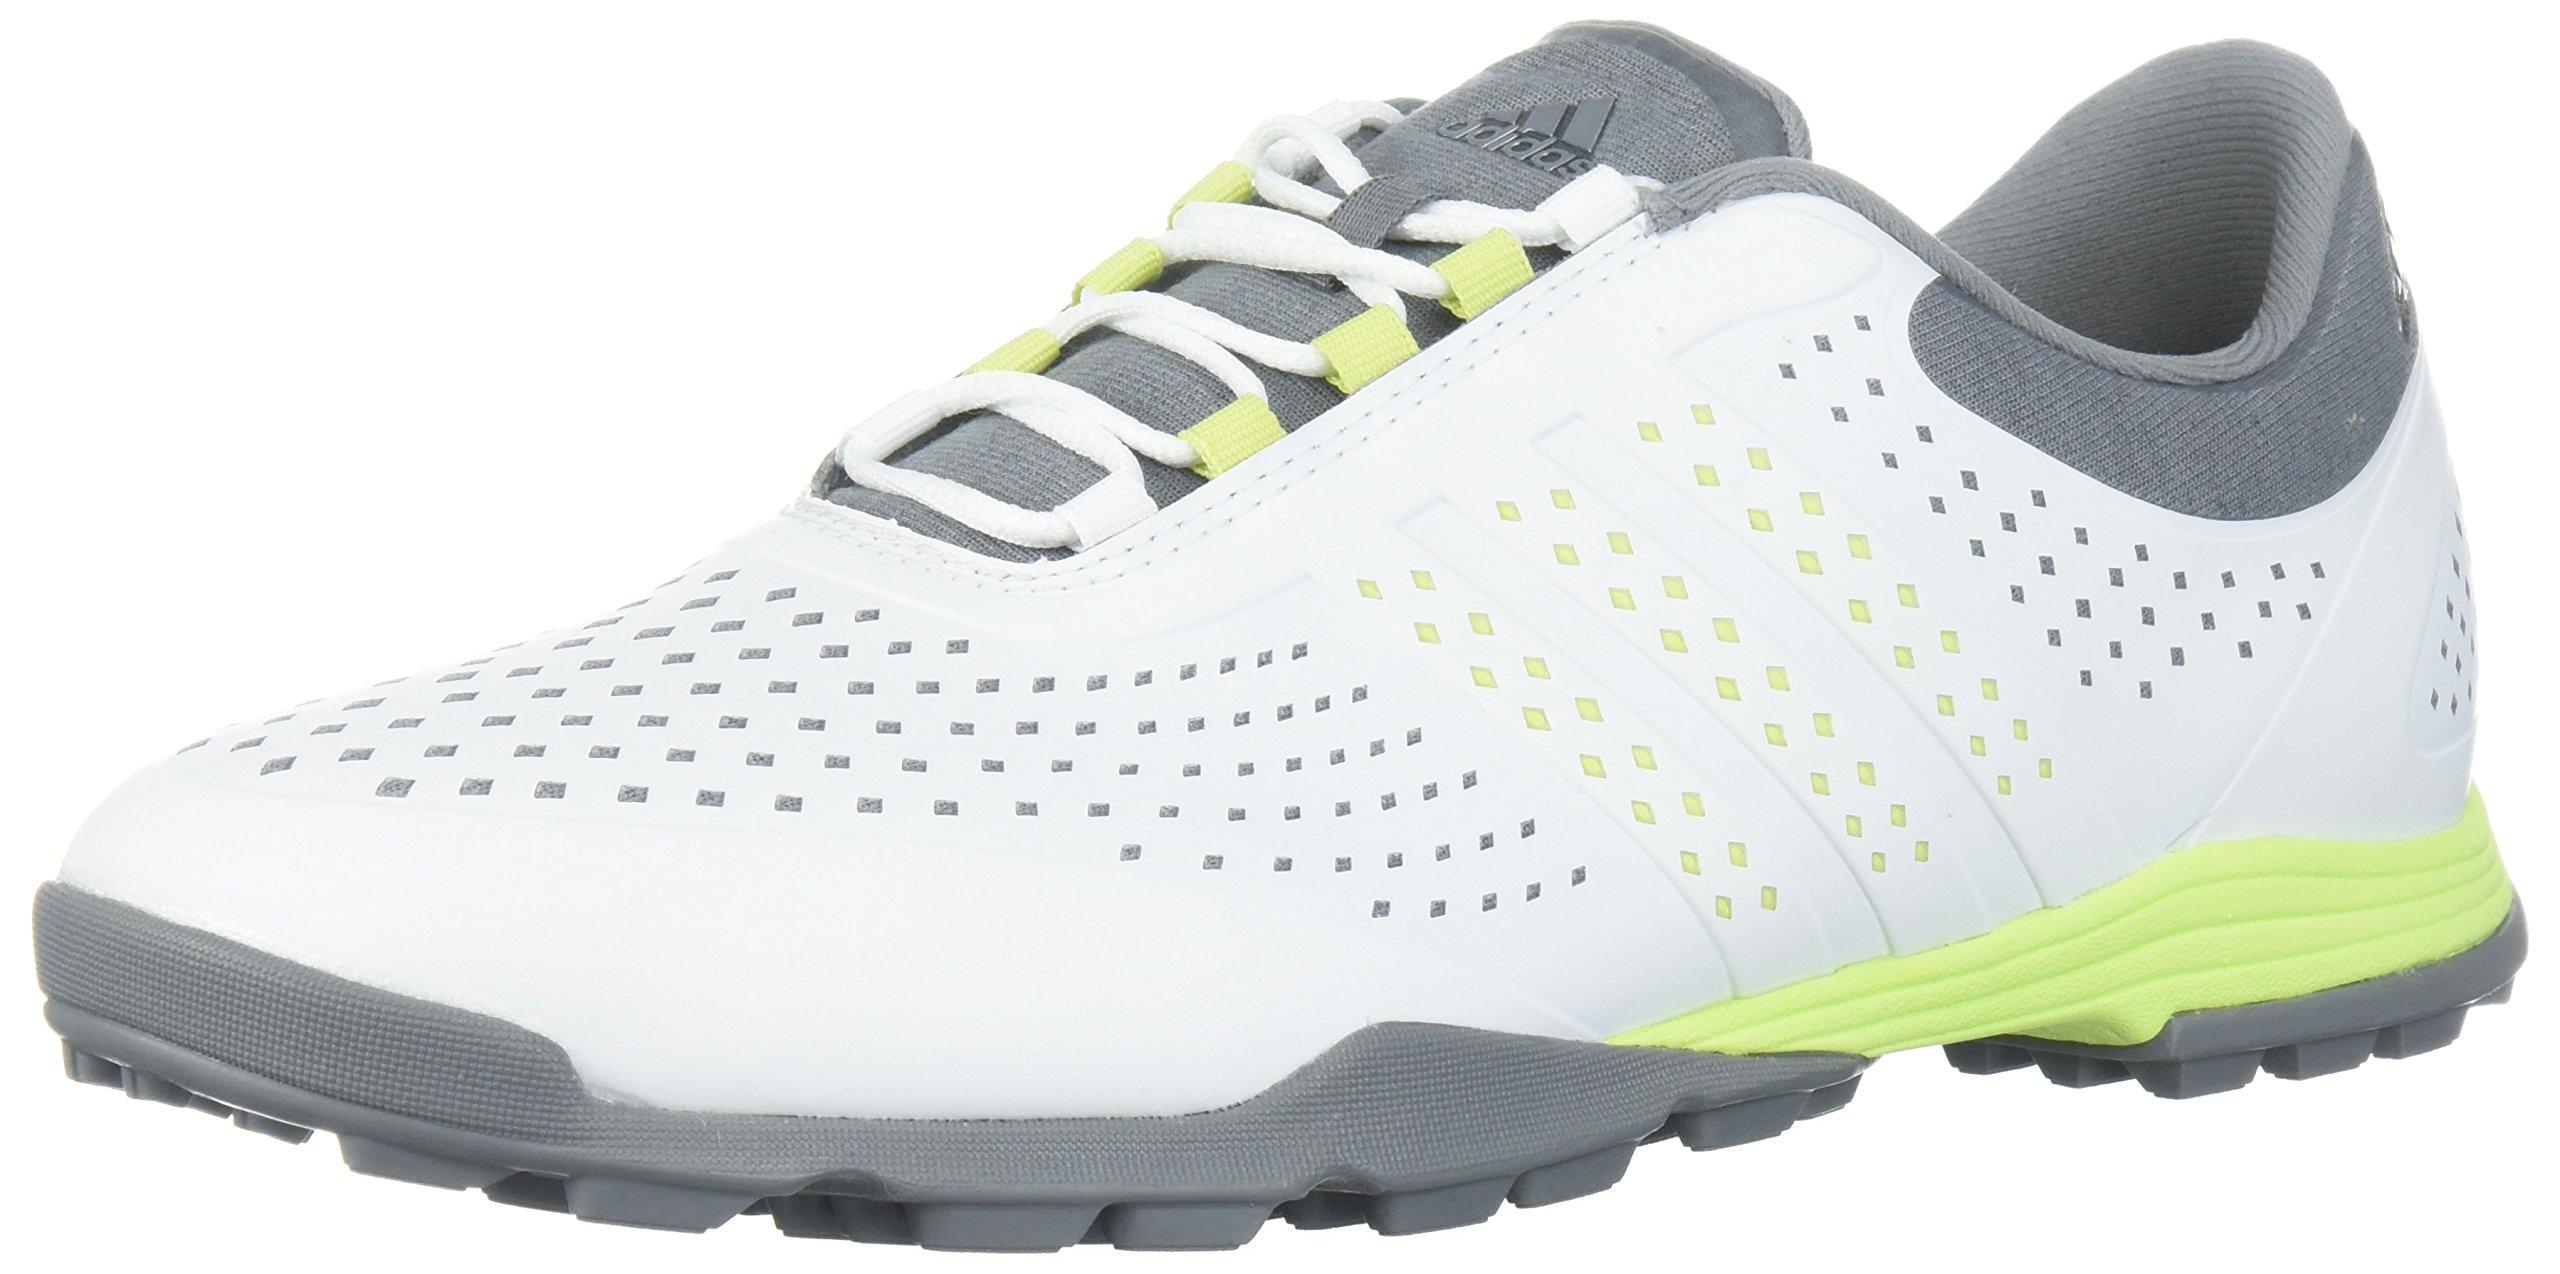 adidas Women's Adipure Sport Golf Shoe, White/Semi Frozen Yellow/Grey, 5.5 Medium US